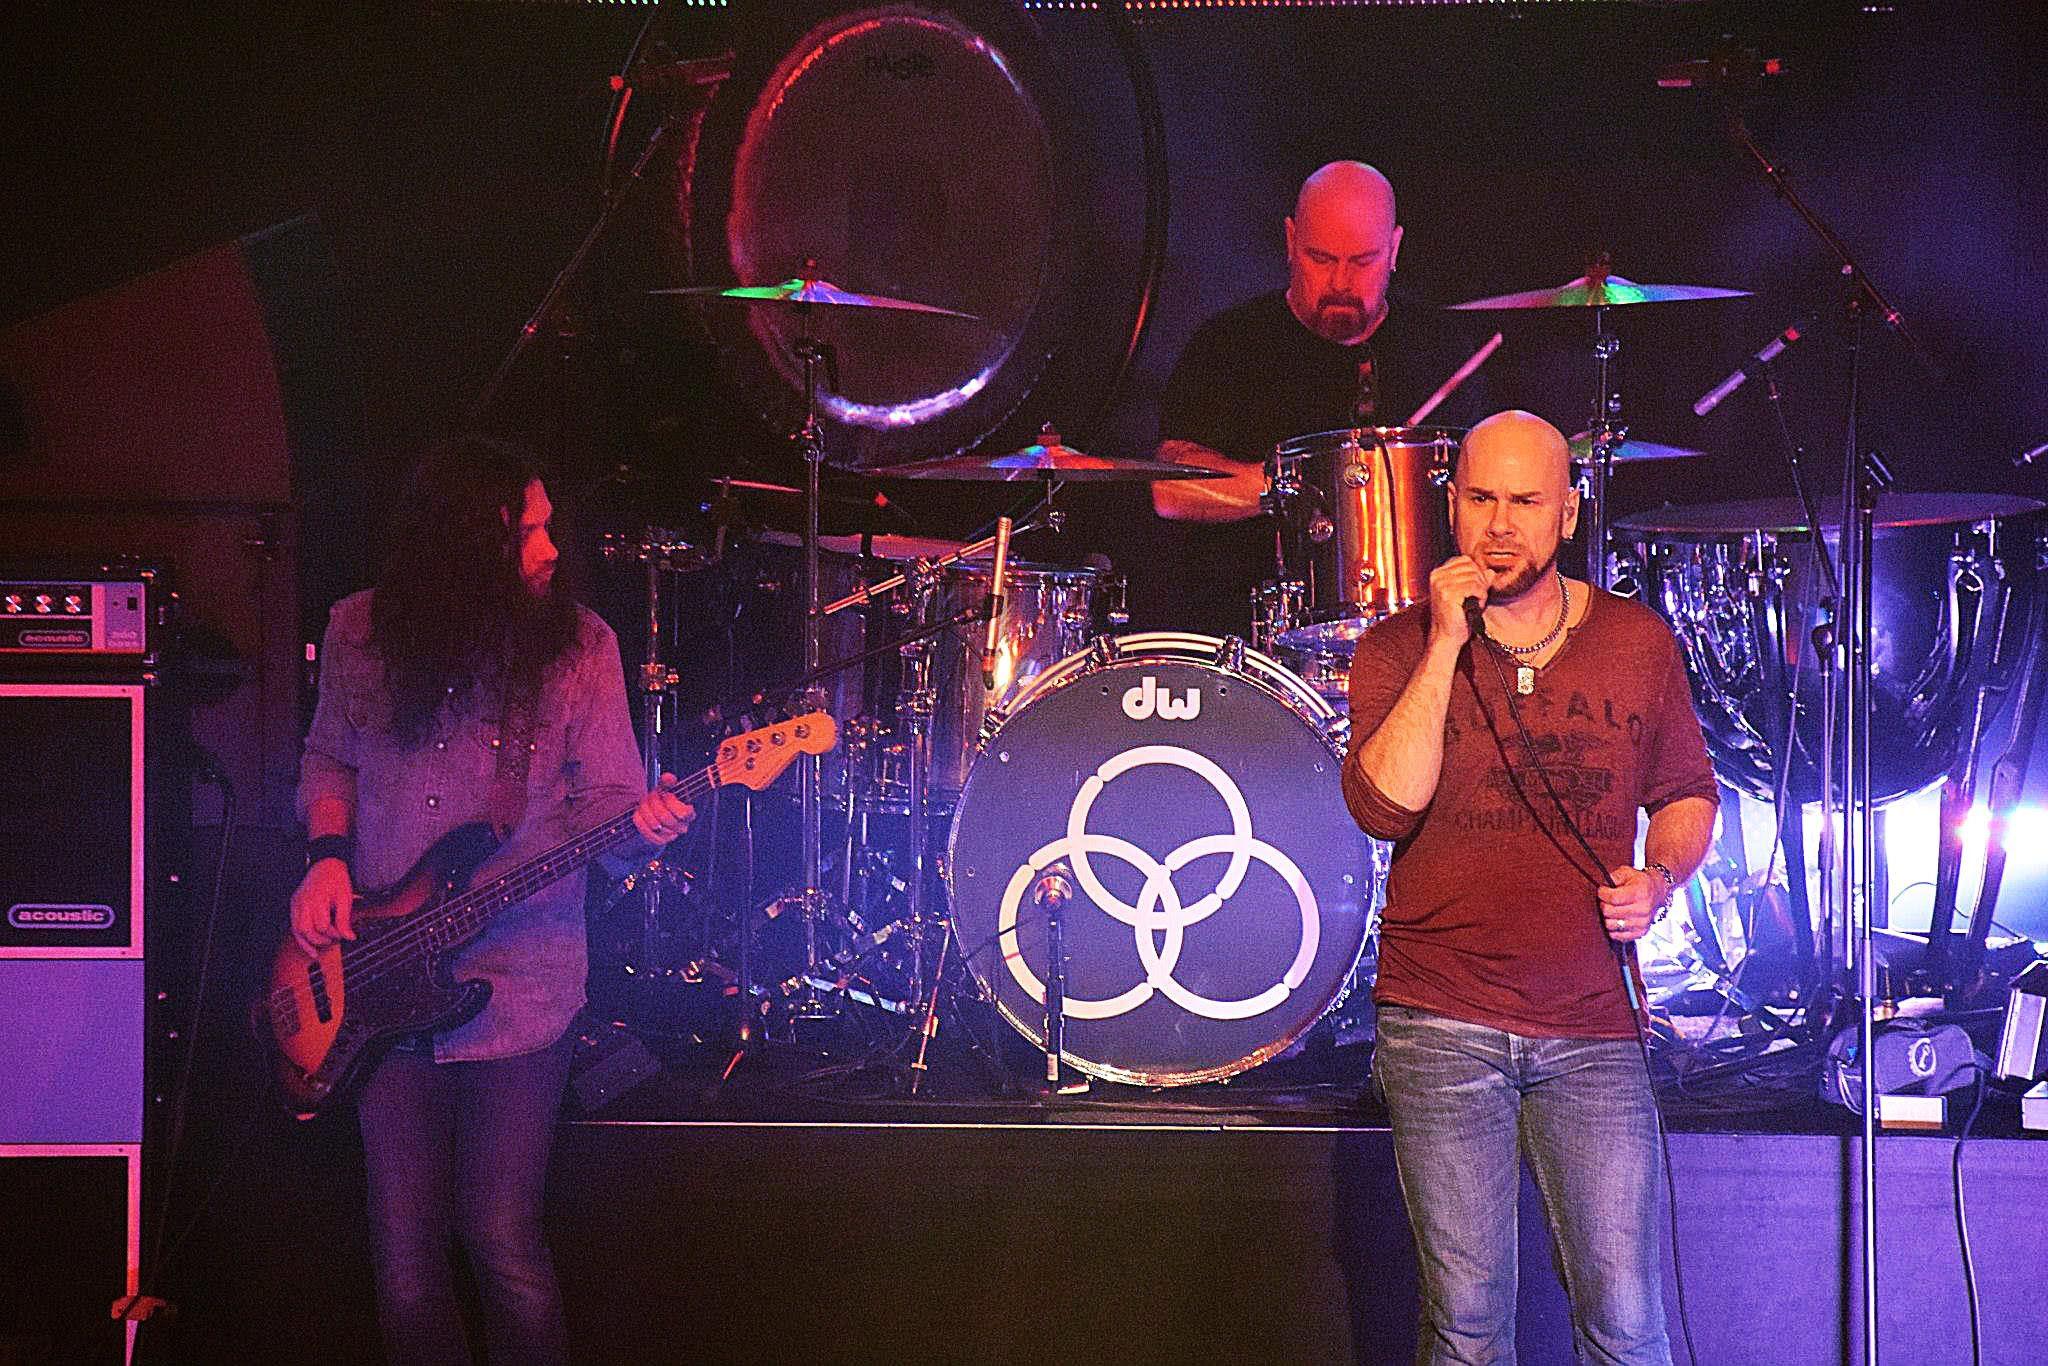 That's The Way - Jason Bonham's Led Zeppelin Experience (JBLZE) #JasonBonhamsLedZeppelinExperience #JBLZE #LedZeppelinExperience #JasonBonham #ThatsTheWay #JamesDylan #DorianHeartsong #TonyCatania #LedZeppelin #LedZep #Zep #Zeppelin #Bonzo #JohnBonham #JohnHenryBonham #JamesNorthernVA